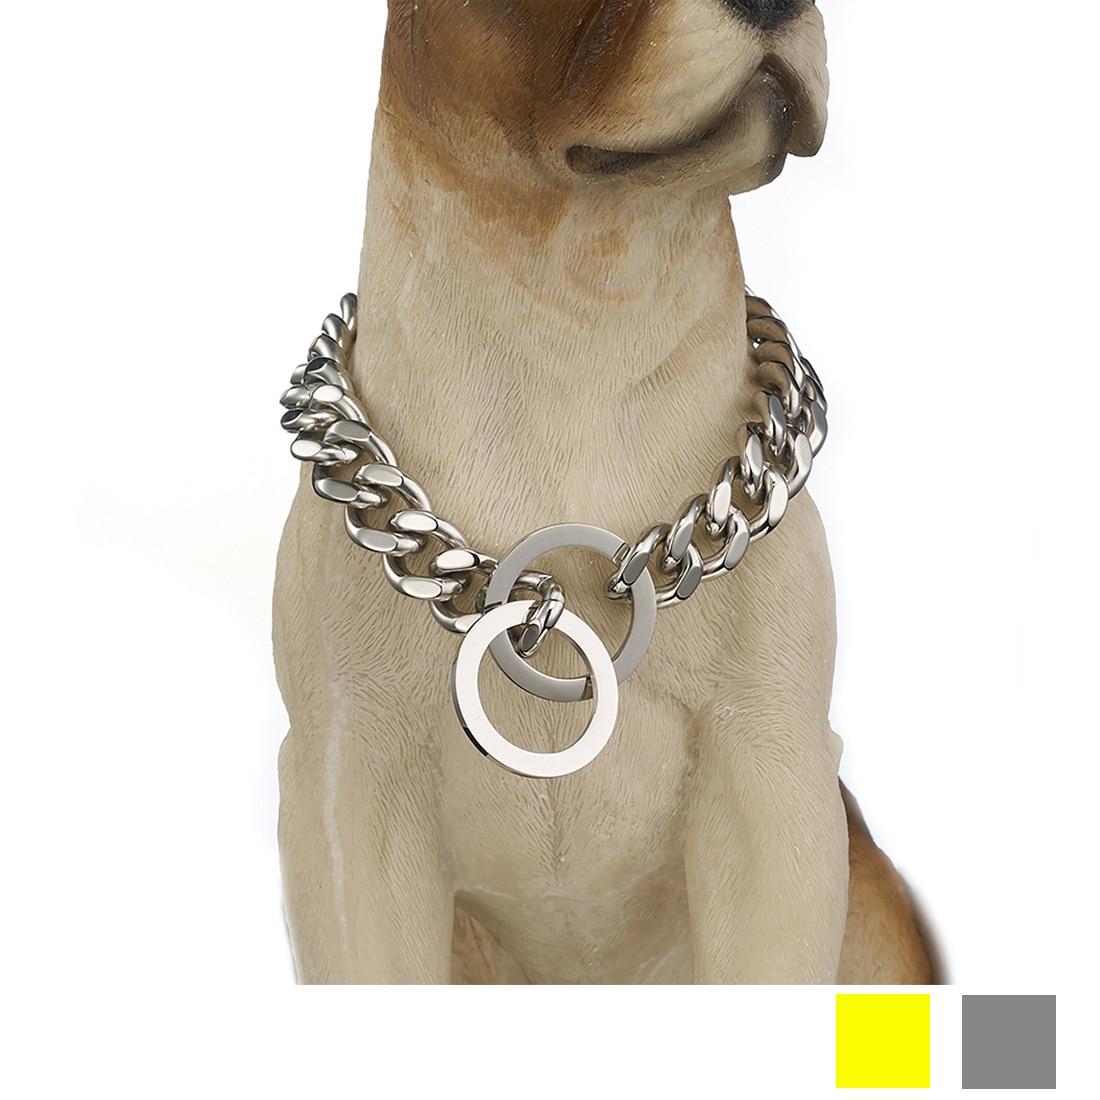 12/15 Size Pet Supplies Gold Dog Pendant Sub-Denim Pendant P Pendant Stainless Steel Metal Neck Ring Supply Of Goods